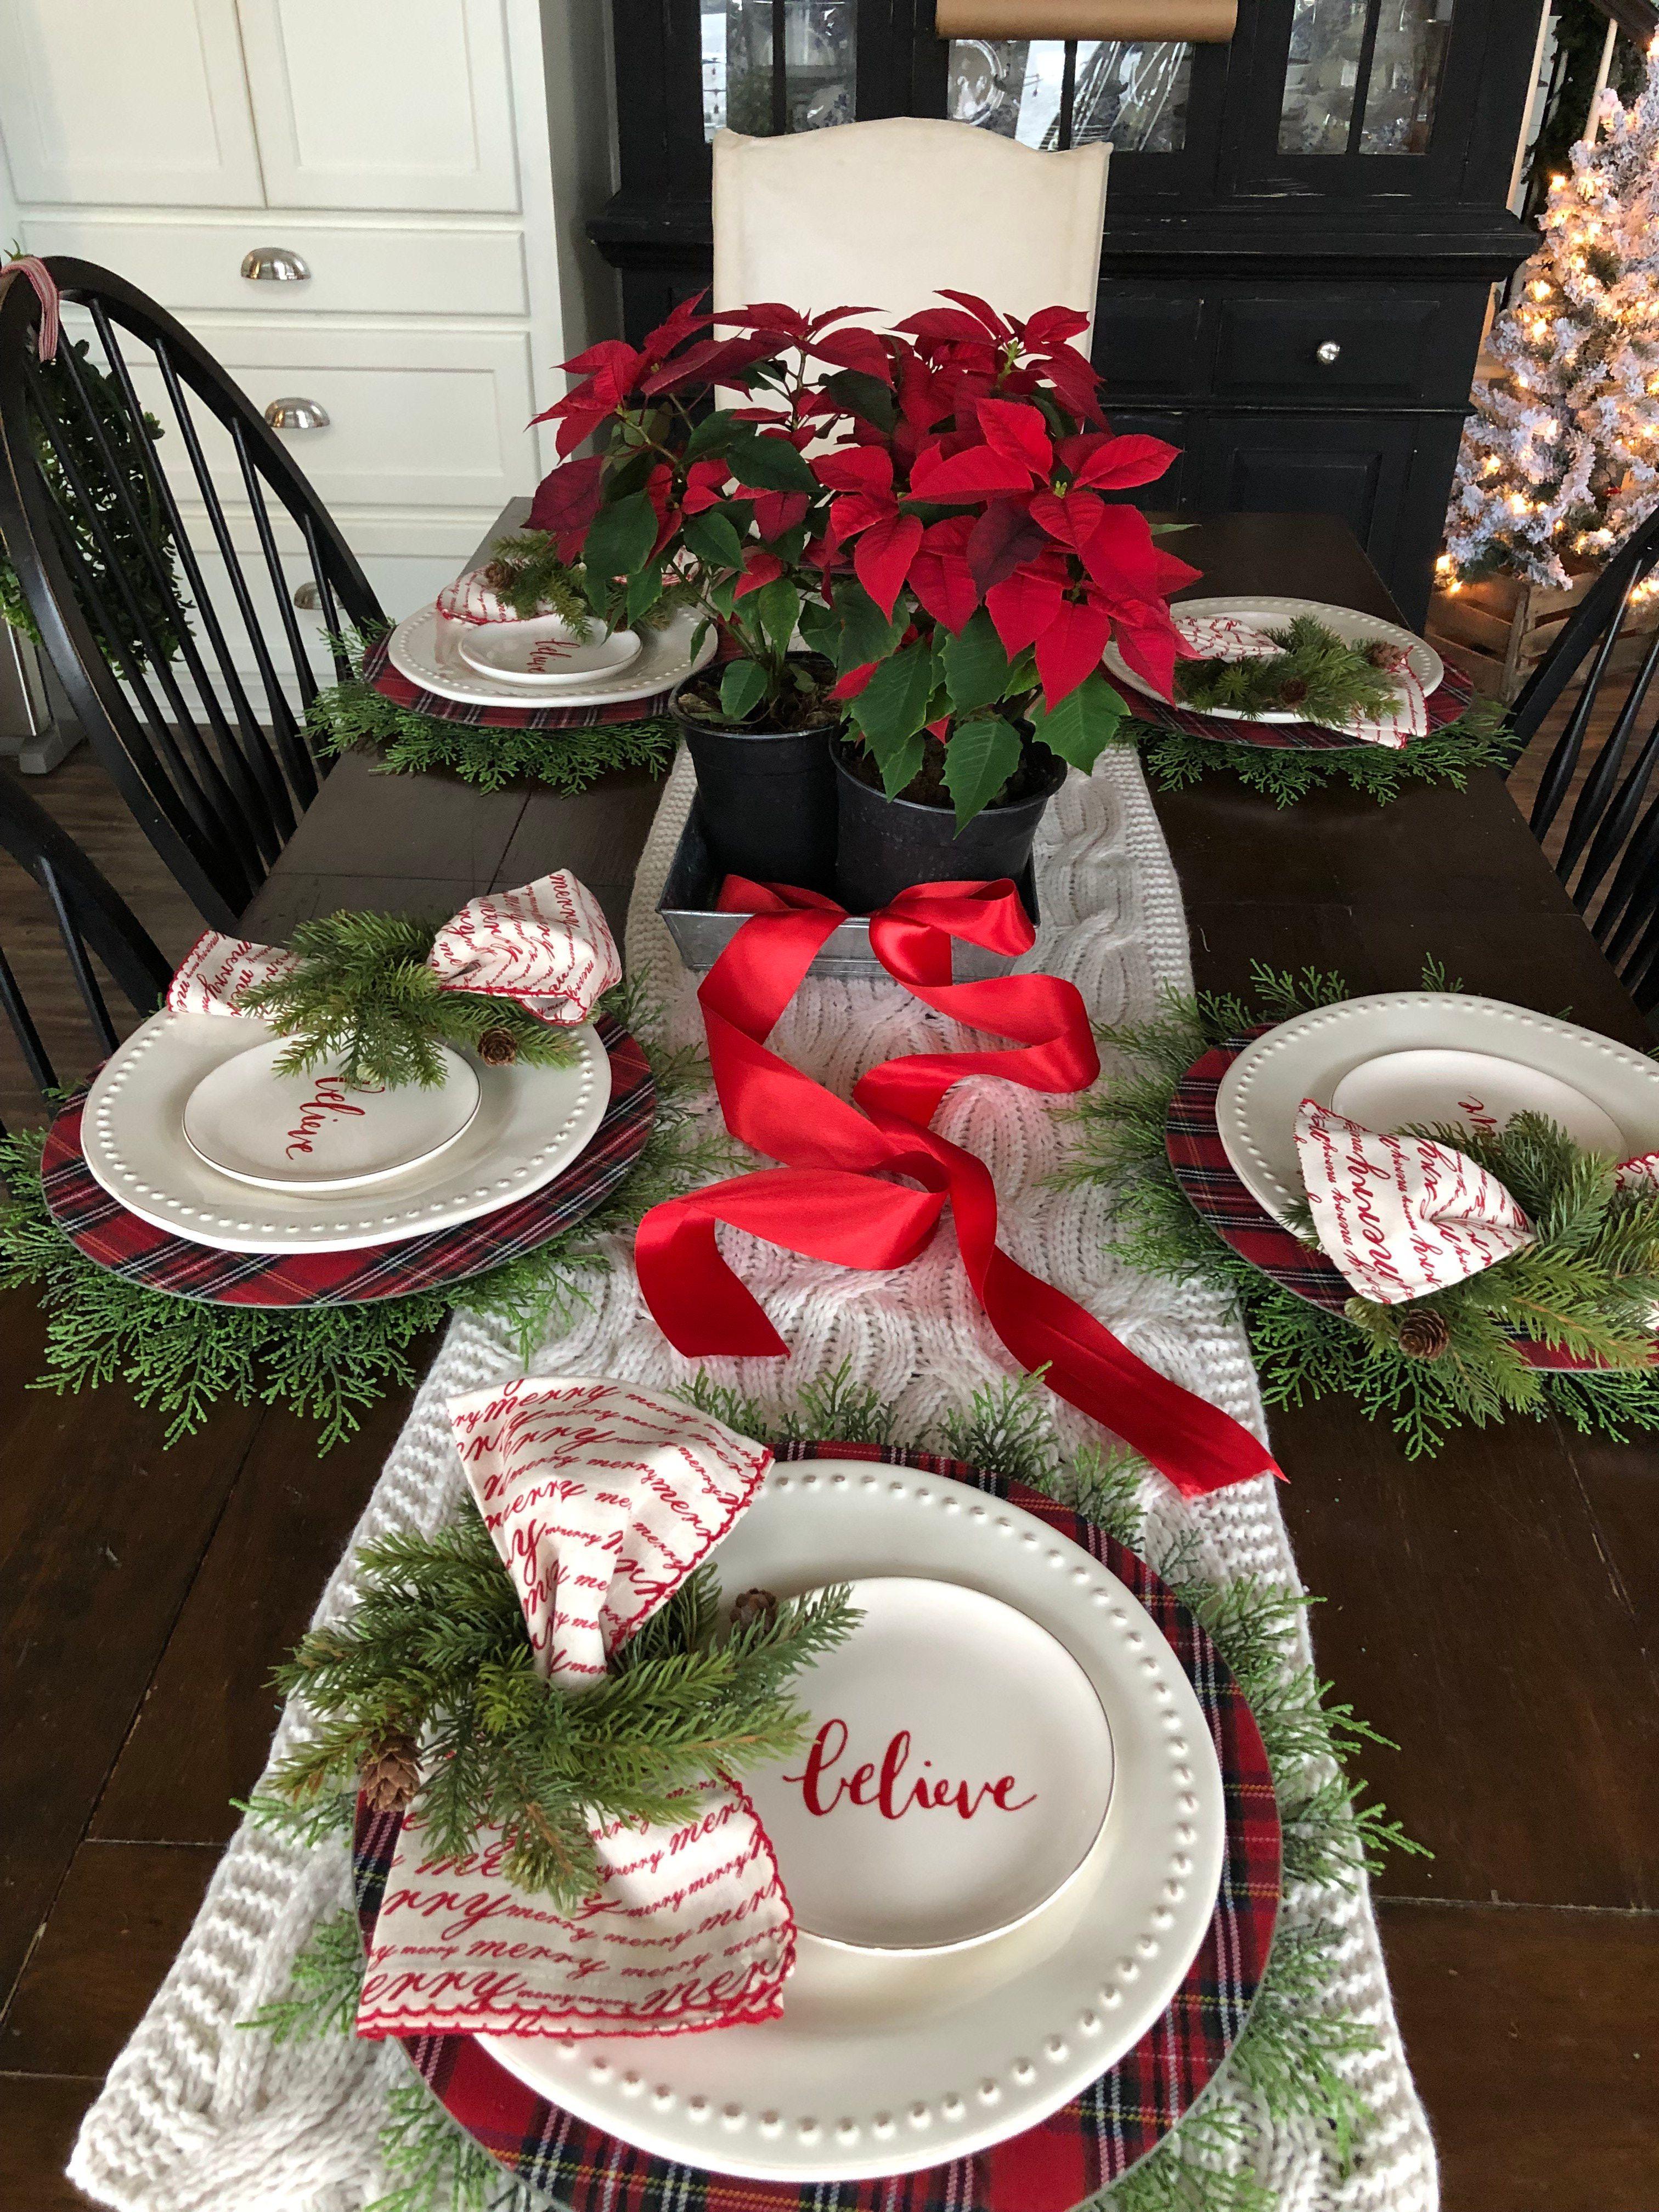 Christmas Table Setting Ideas Holiday Table Decorations Christmas Table Christmas Tabletop